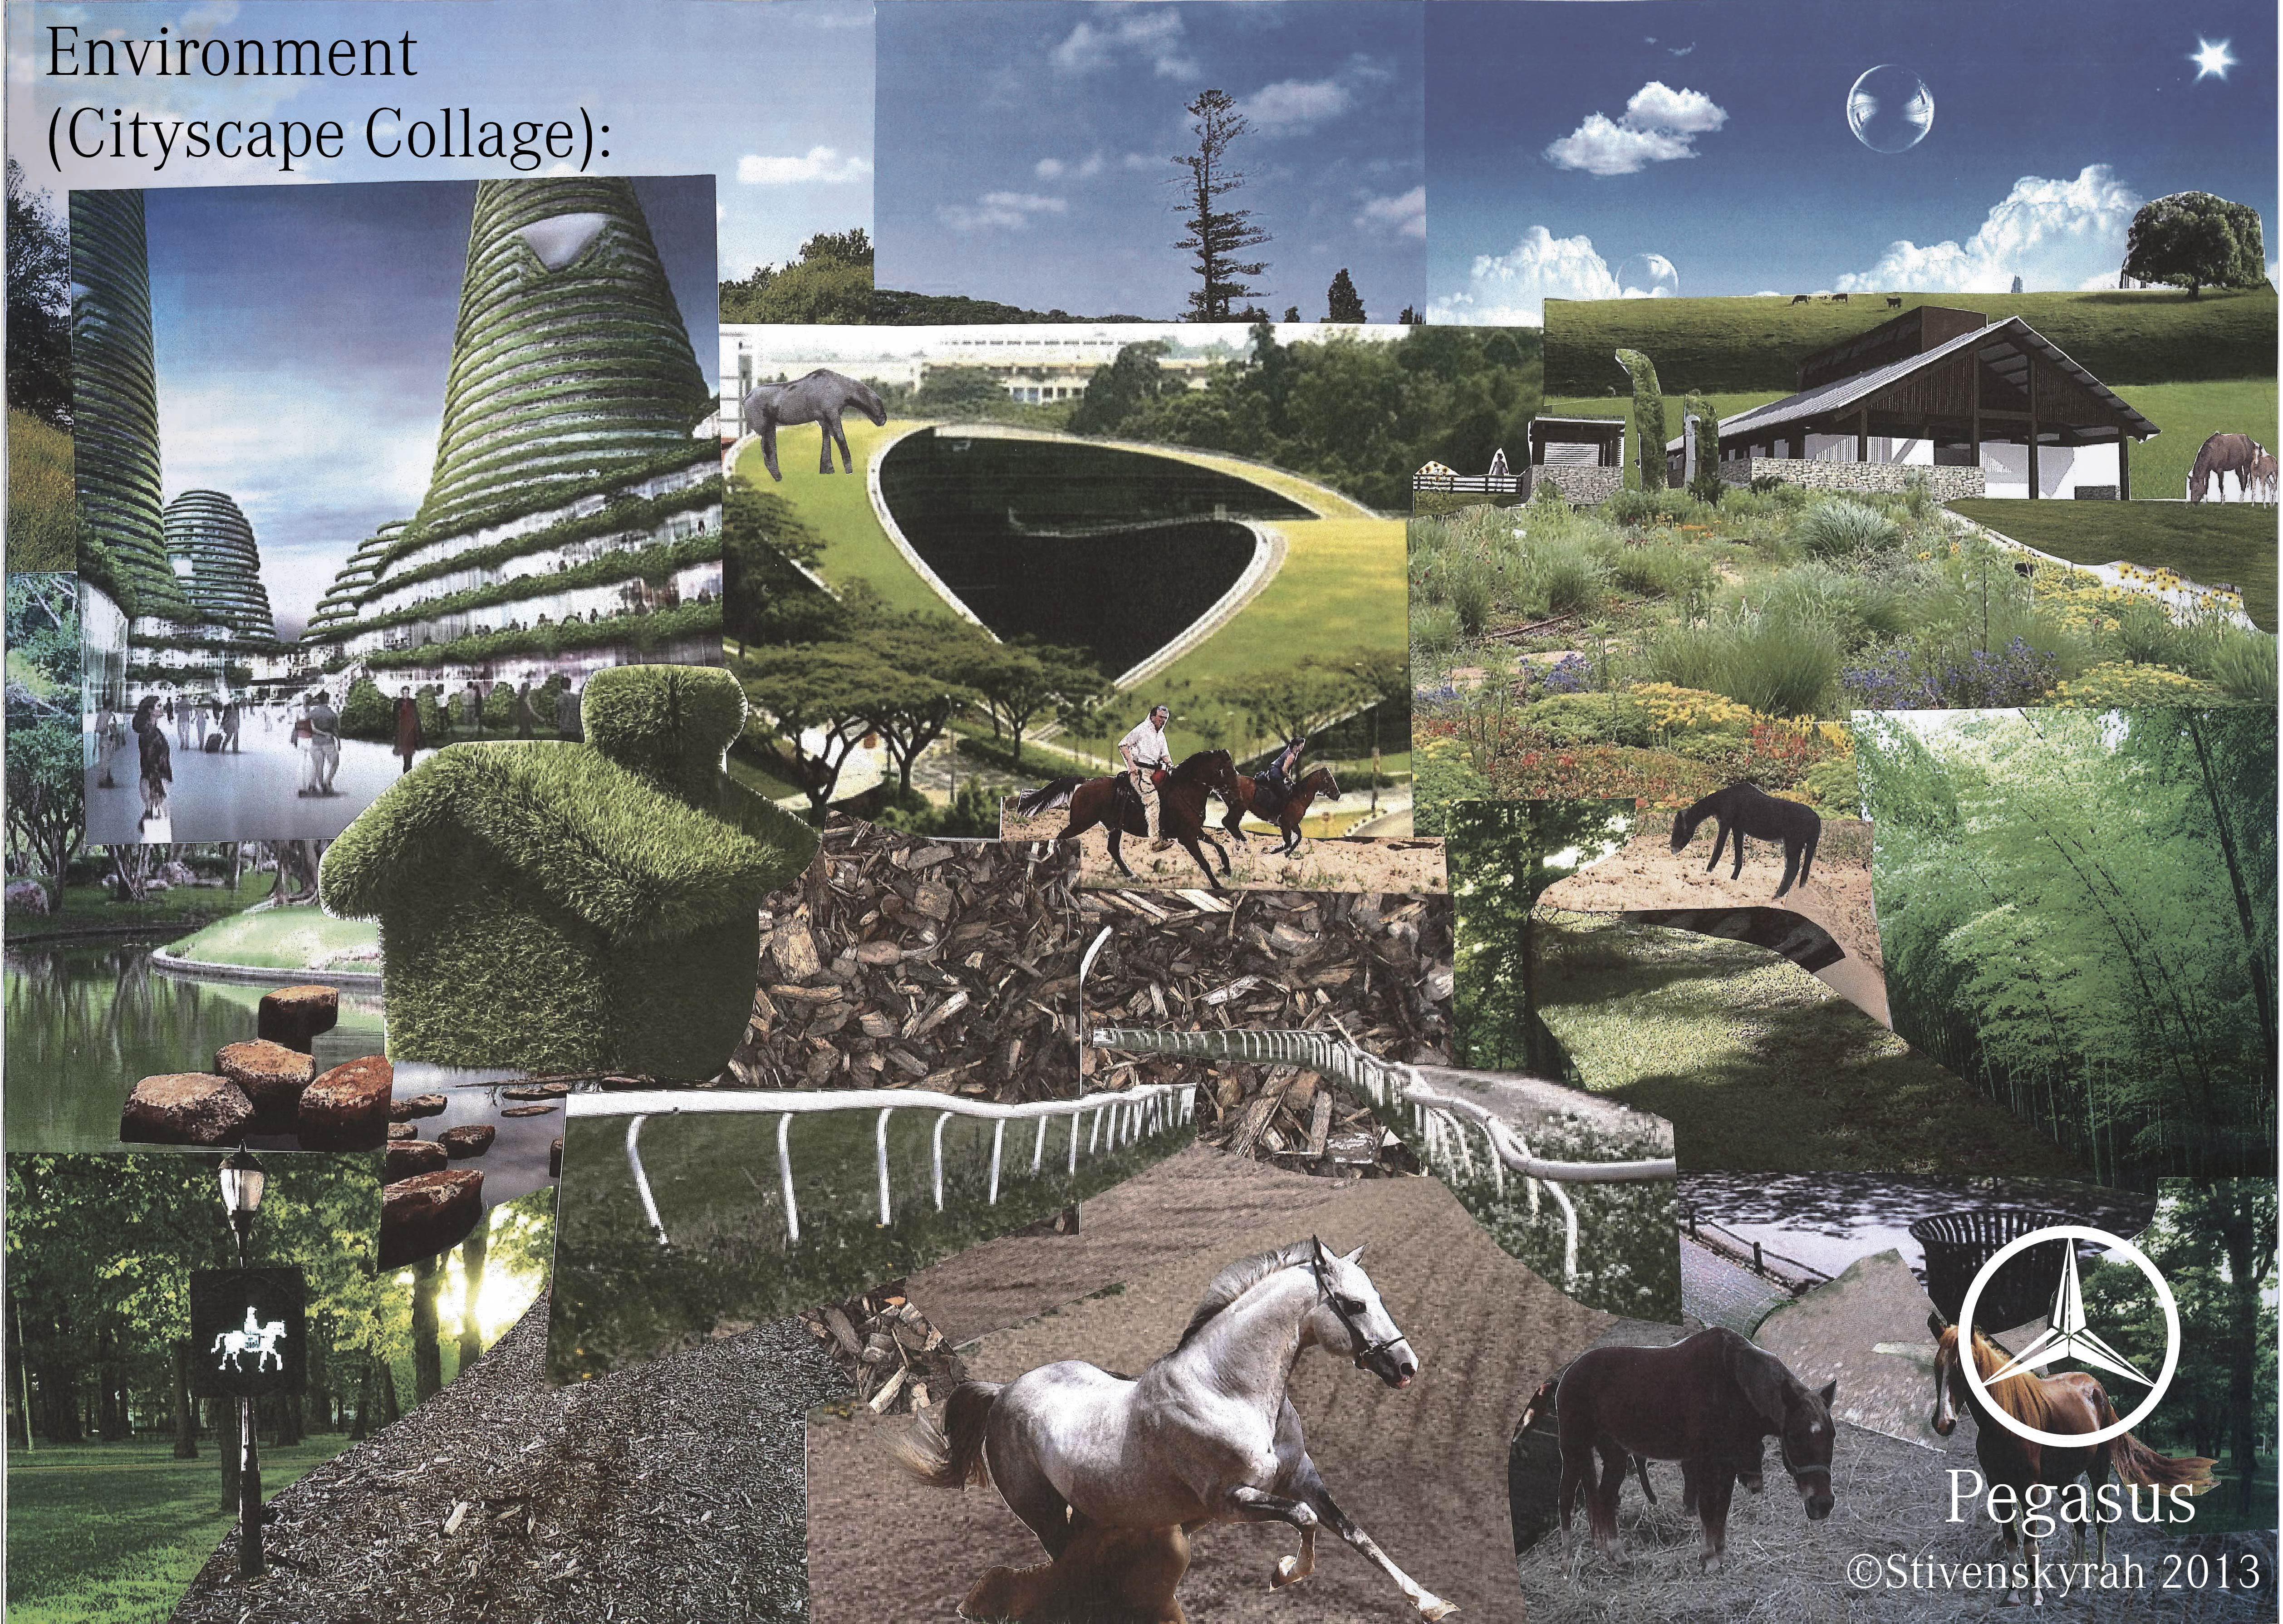 02-collage-pegasus-stivenskyrah-designwithlove